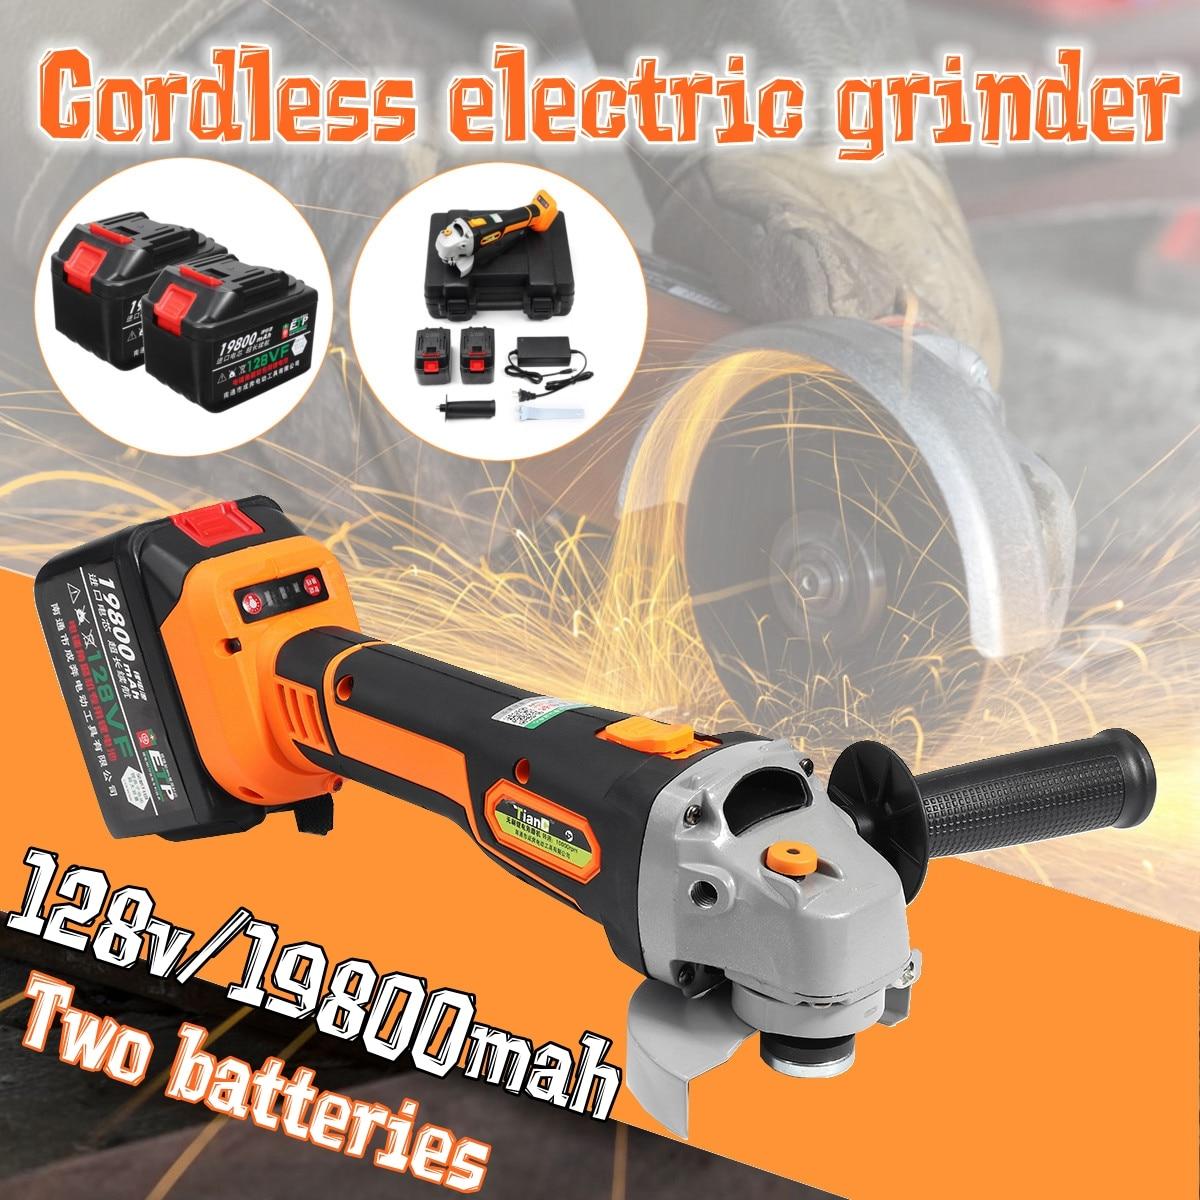 купить 128V 19800mAh Electric Angle Grinder Cordless Polisher Polishing Machine Cutting Tool Brushless motor Grinding +1/2 Battery недорого